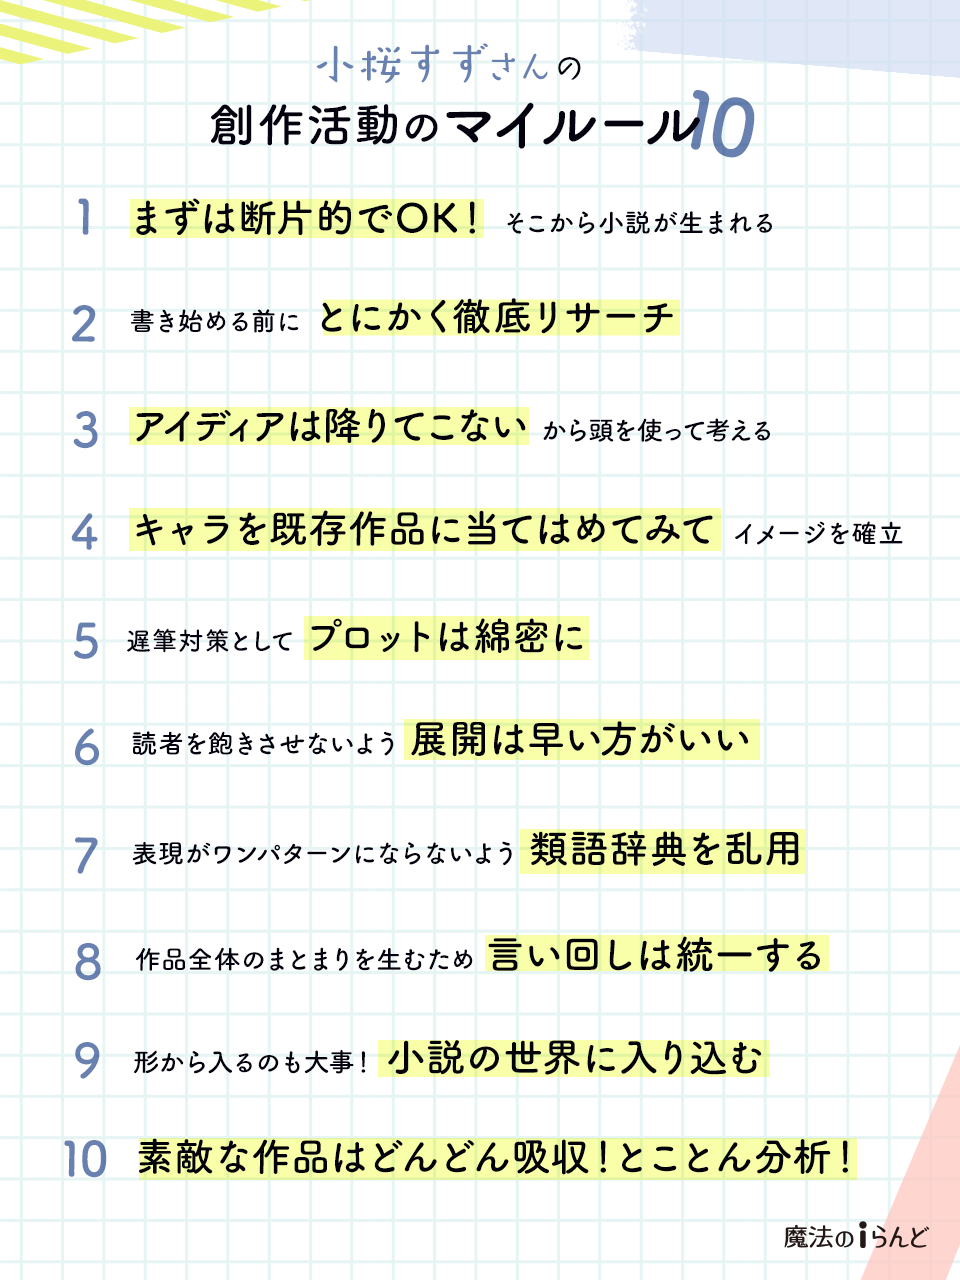 https://storage.googleapis.com/blog-info/entry/2021/08/03-myrule-kozakura_twitter.png